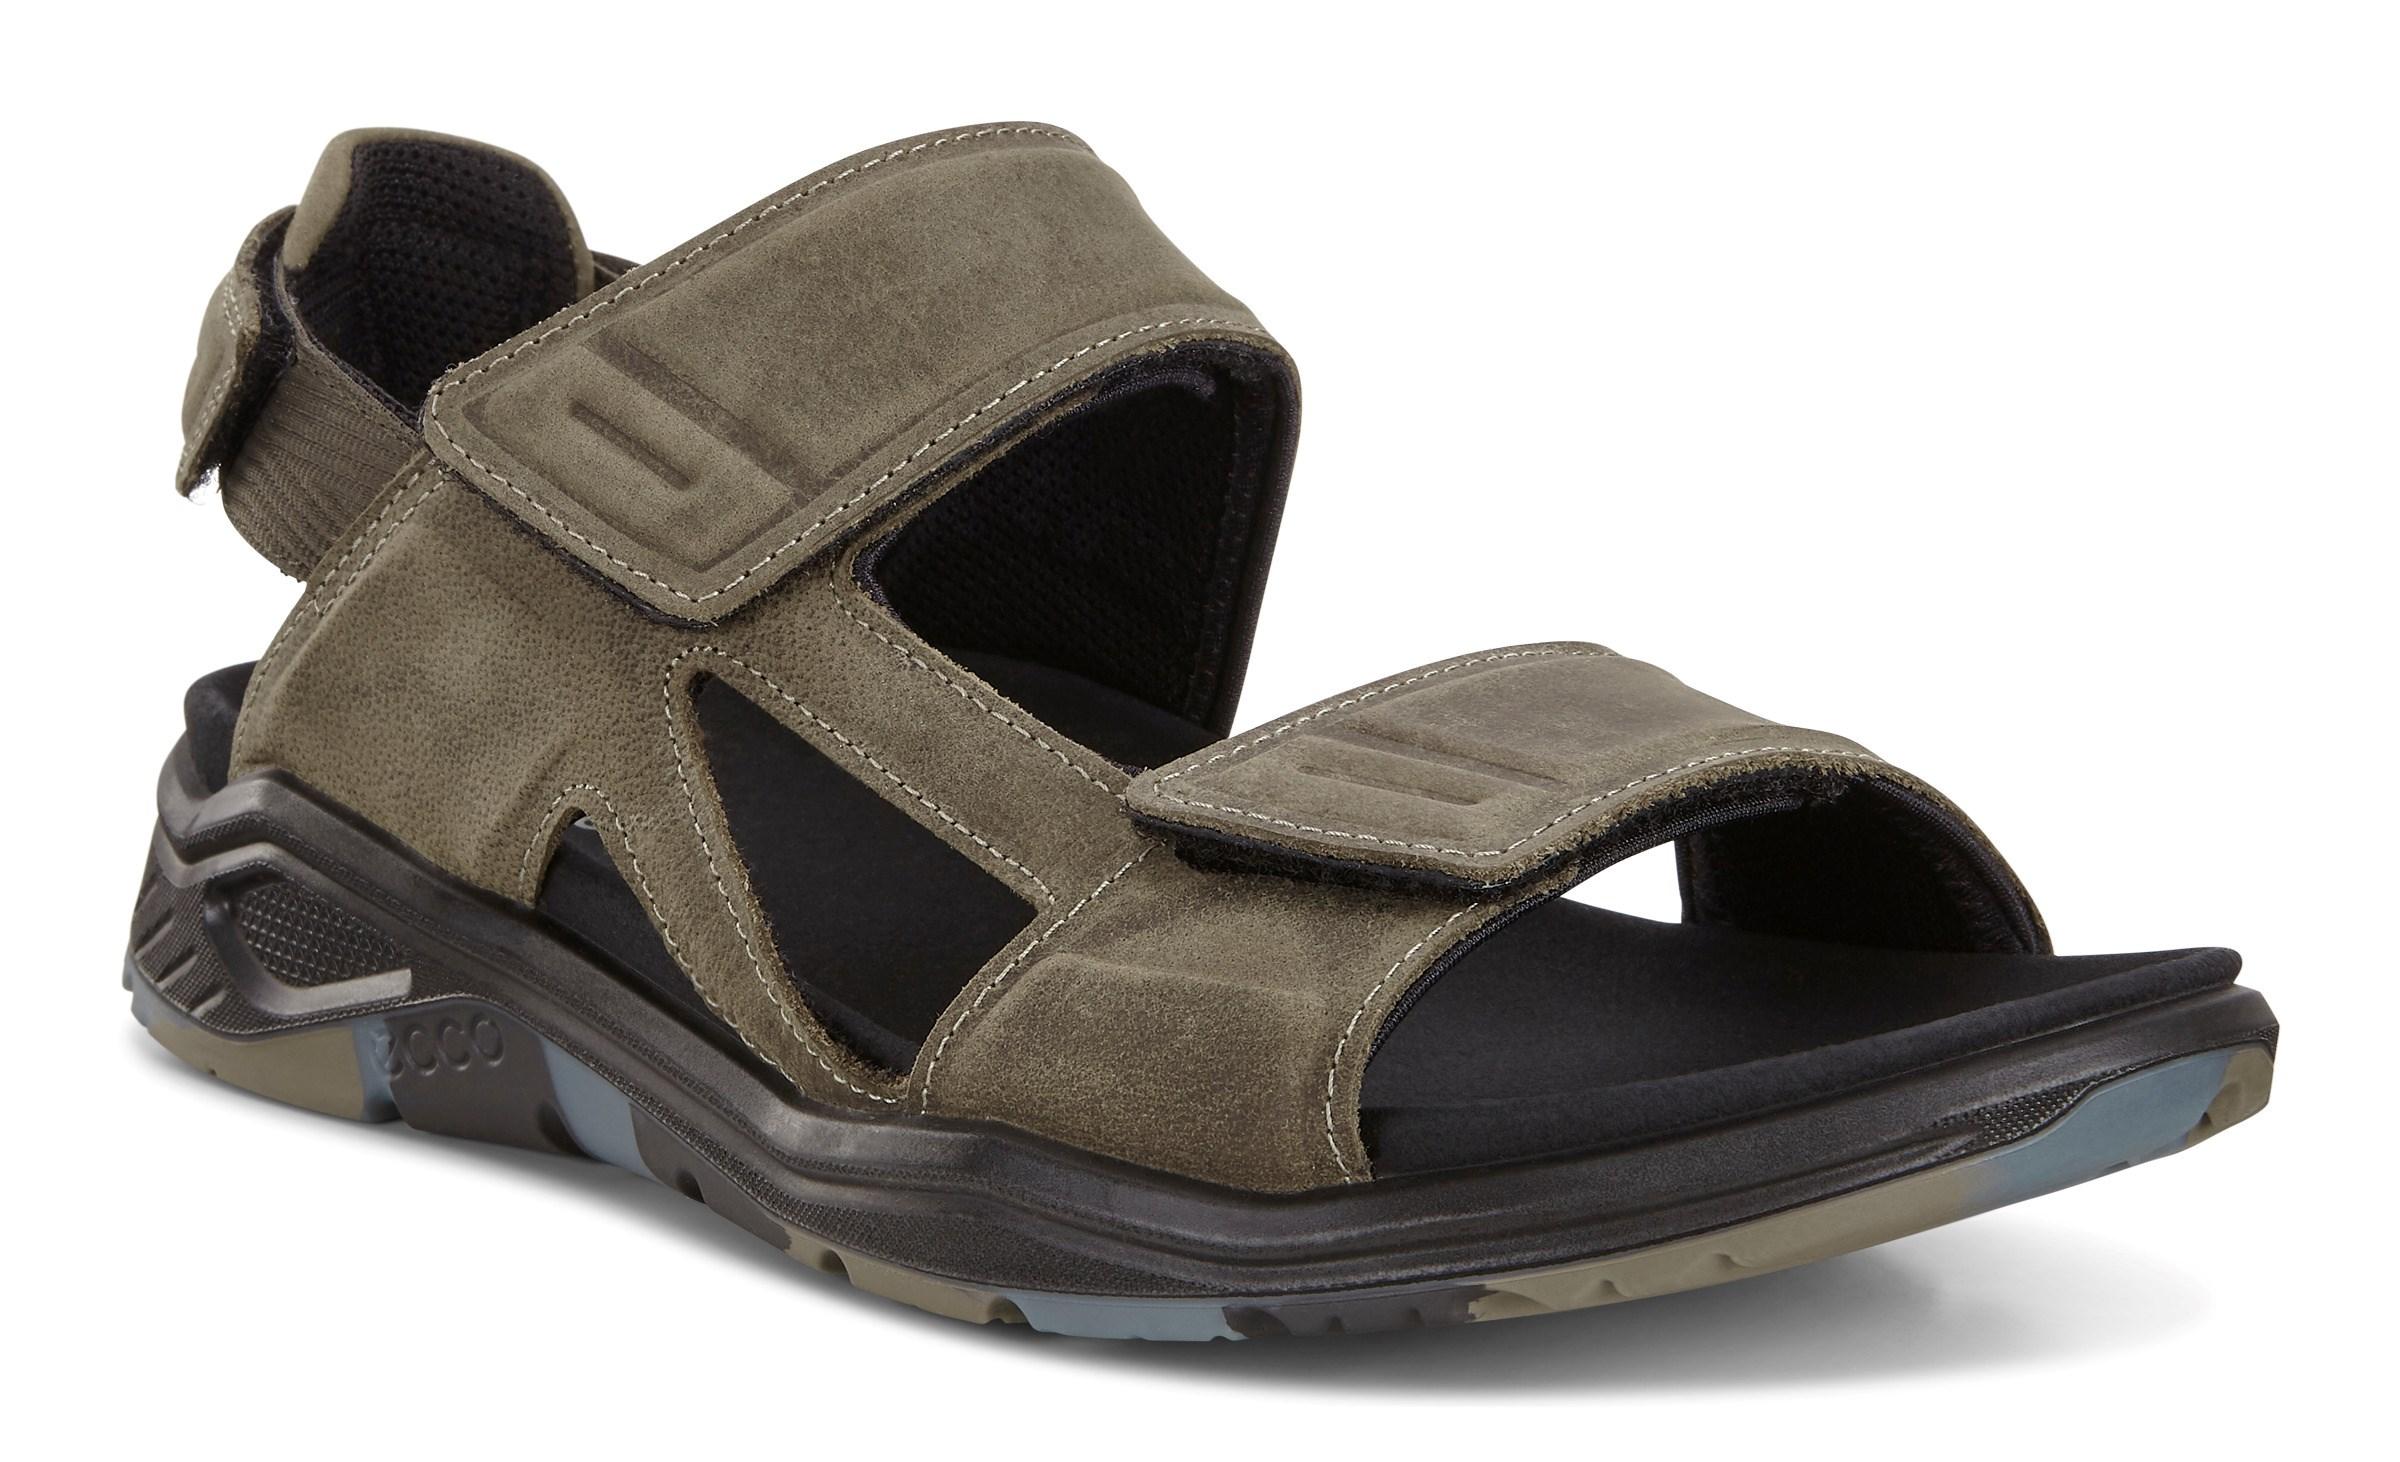 Ecco X trinsic miesten sandaalit